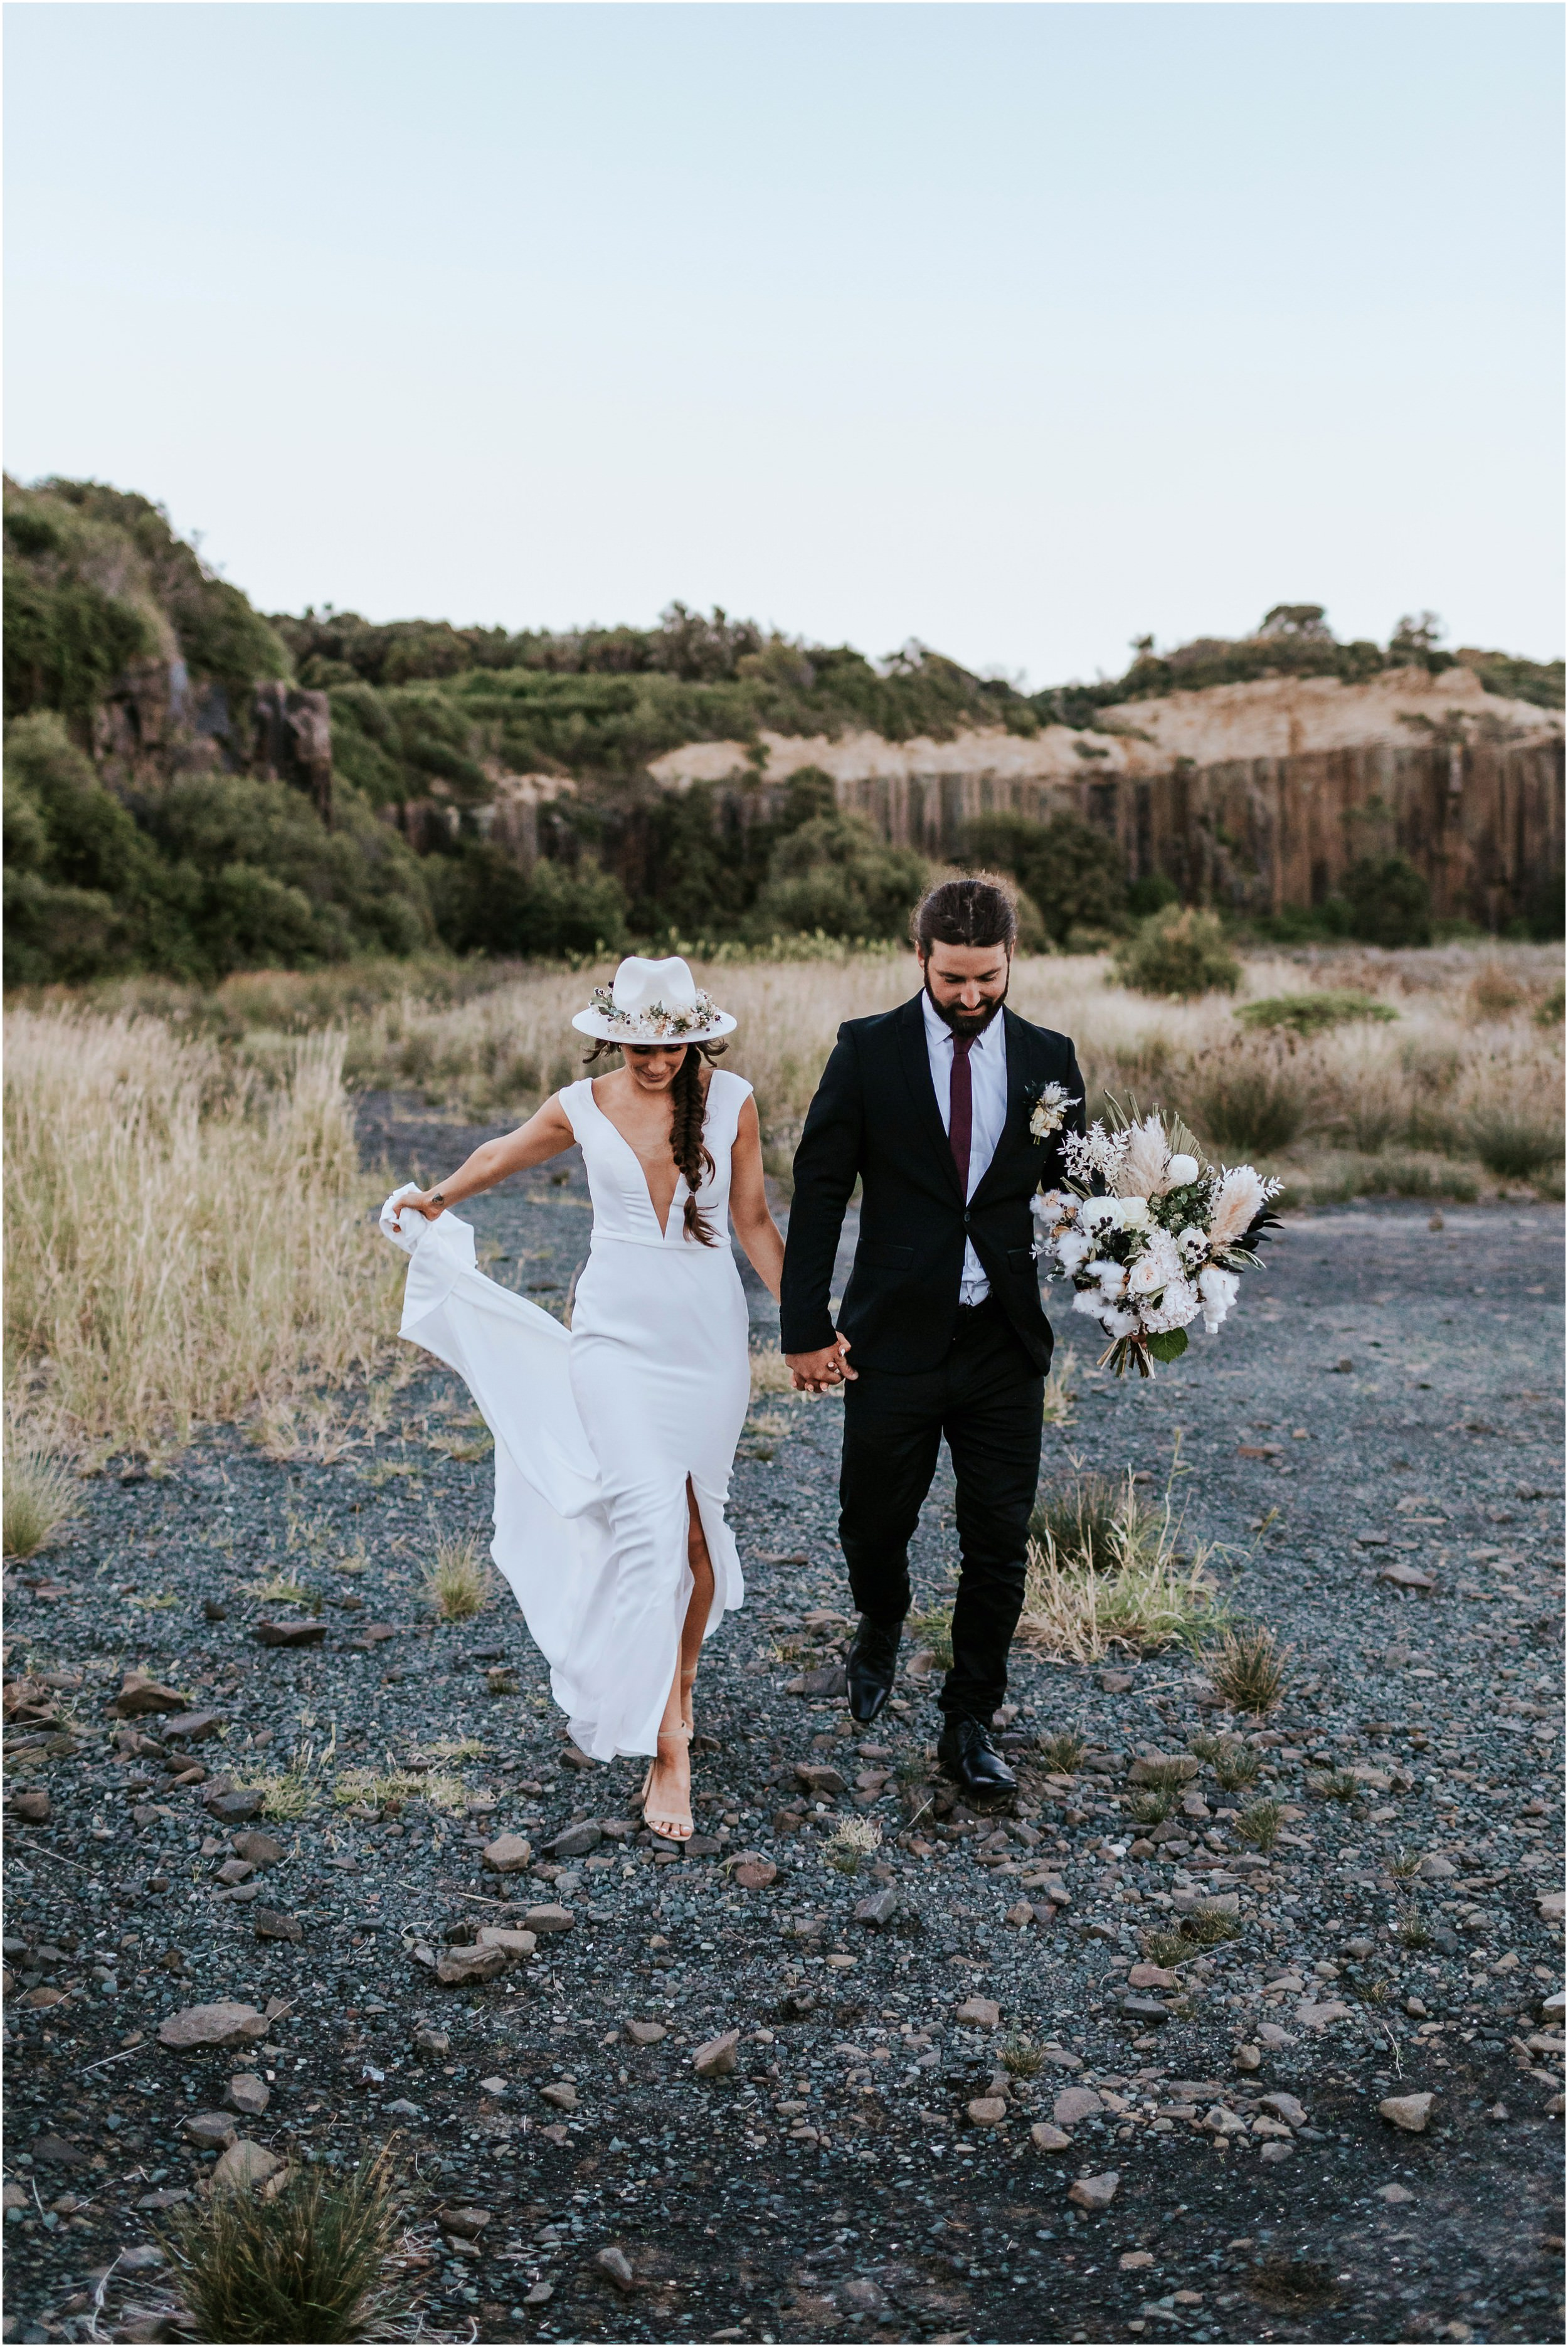 wedding_seacliff_house_alanah_keiran_0130.jpg